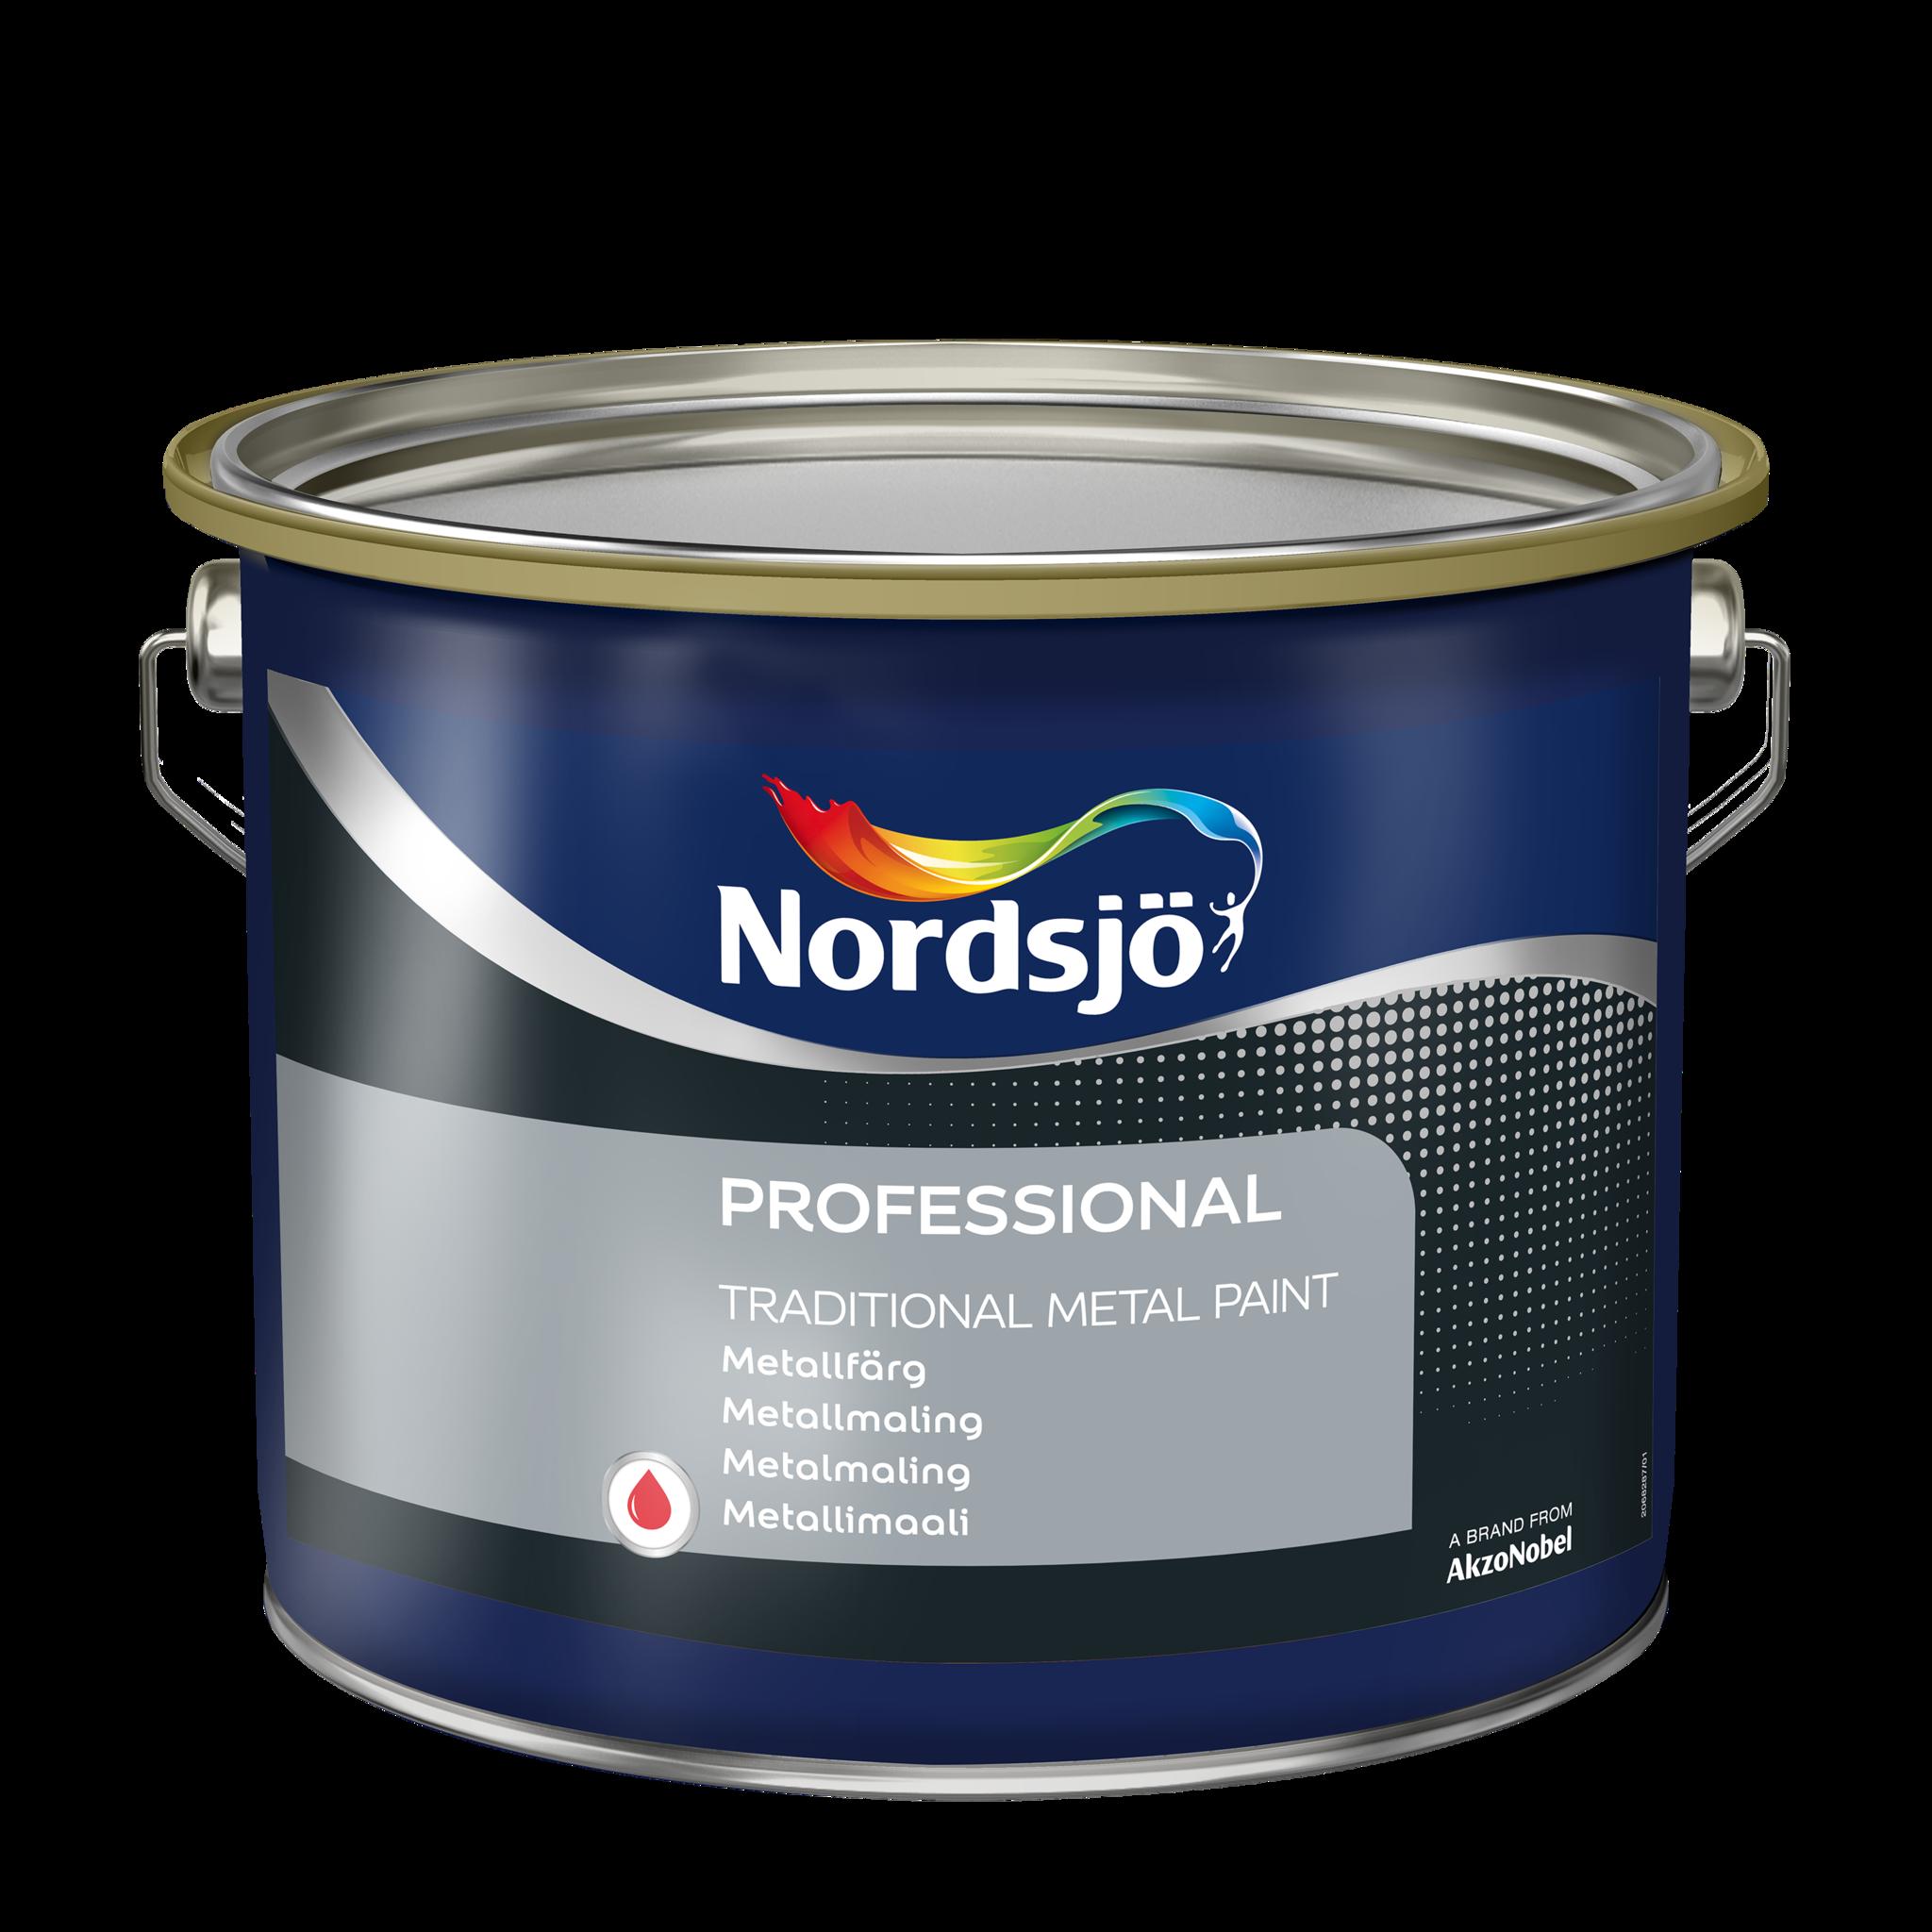 Nordsjö Professional Traditional Metal Paint